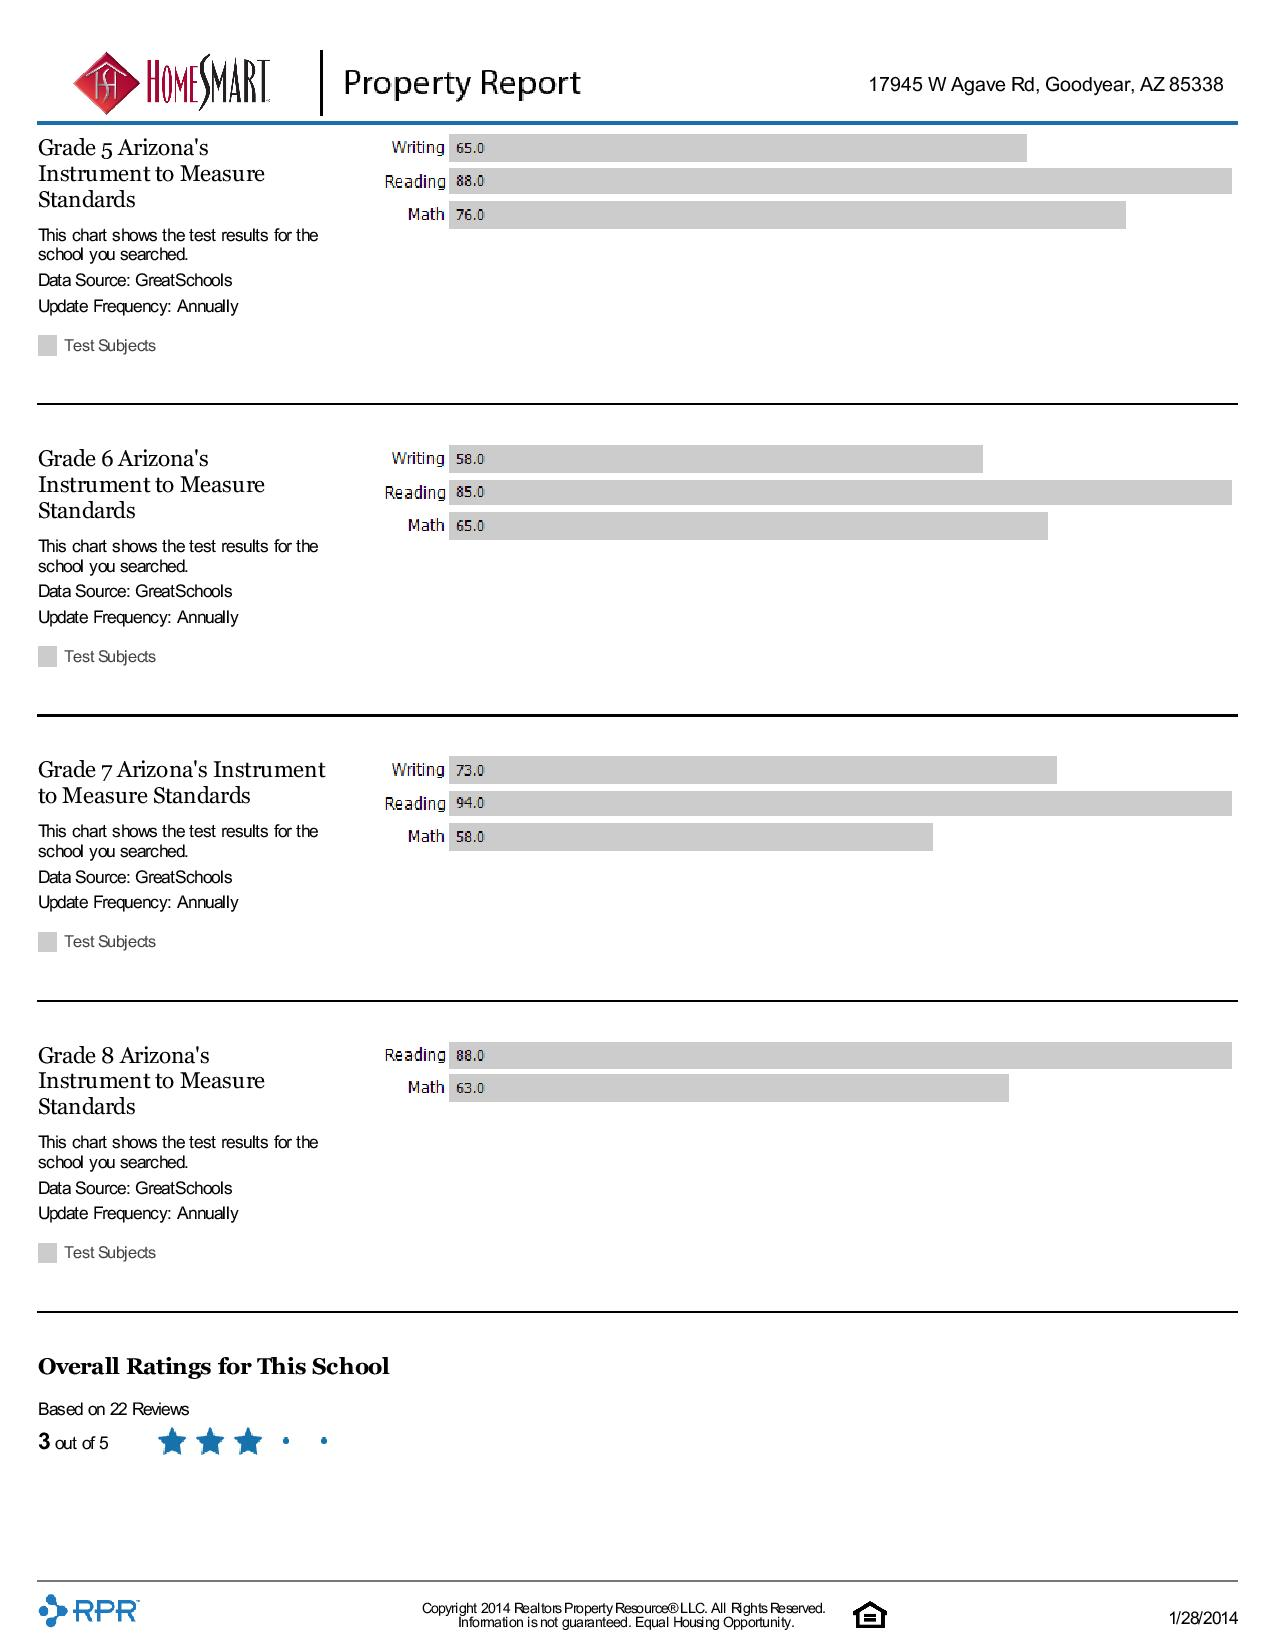 17945-W-Agave-Rd-Goodyear-AZ-85338.pdf-page-013